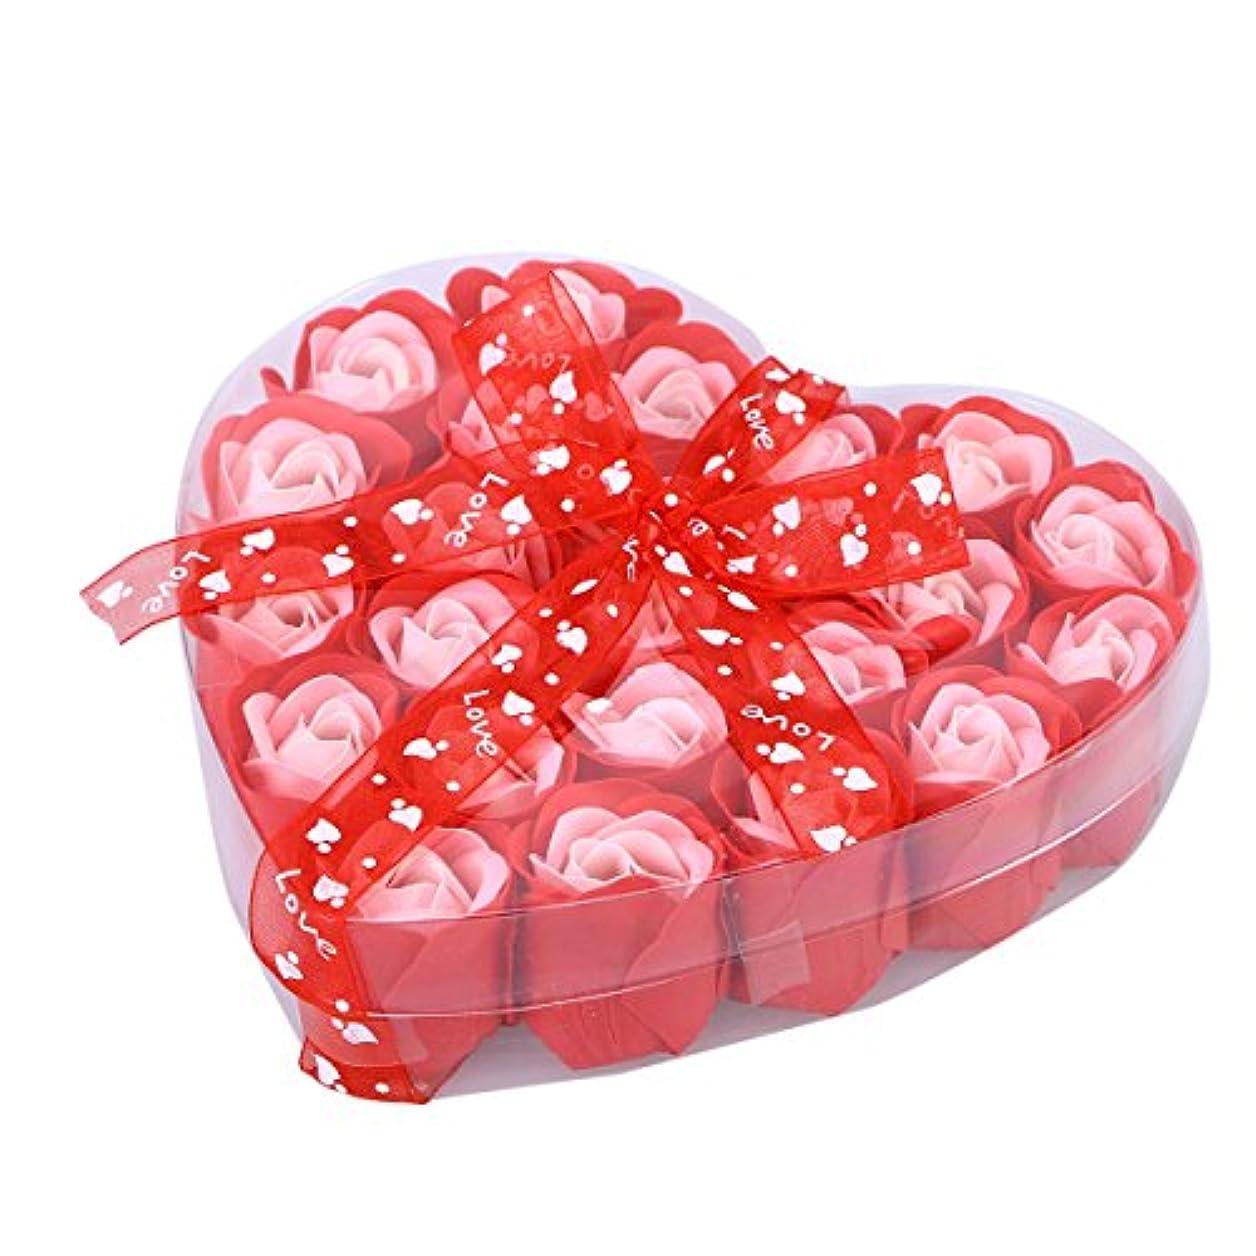 Frcolor 香り付きバスソープ ハートボックスにバラ形のソープ 飾り物 ギフト 24個入